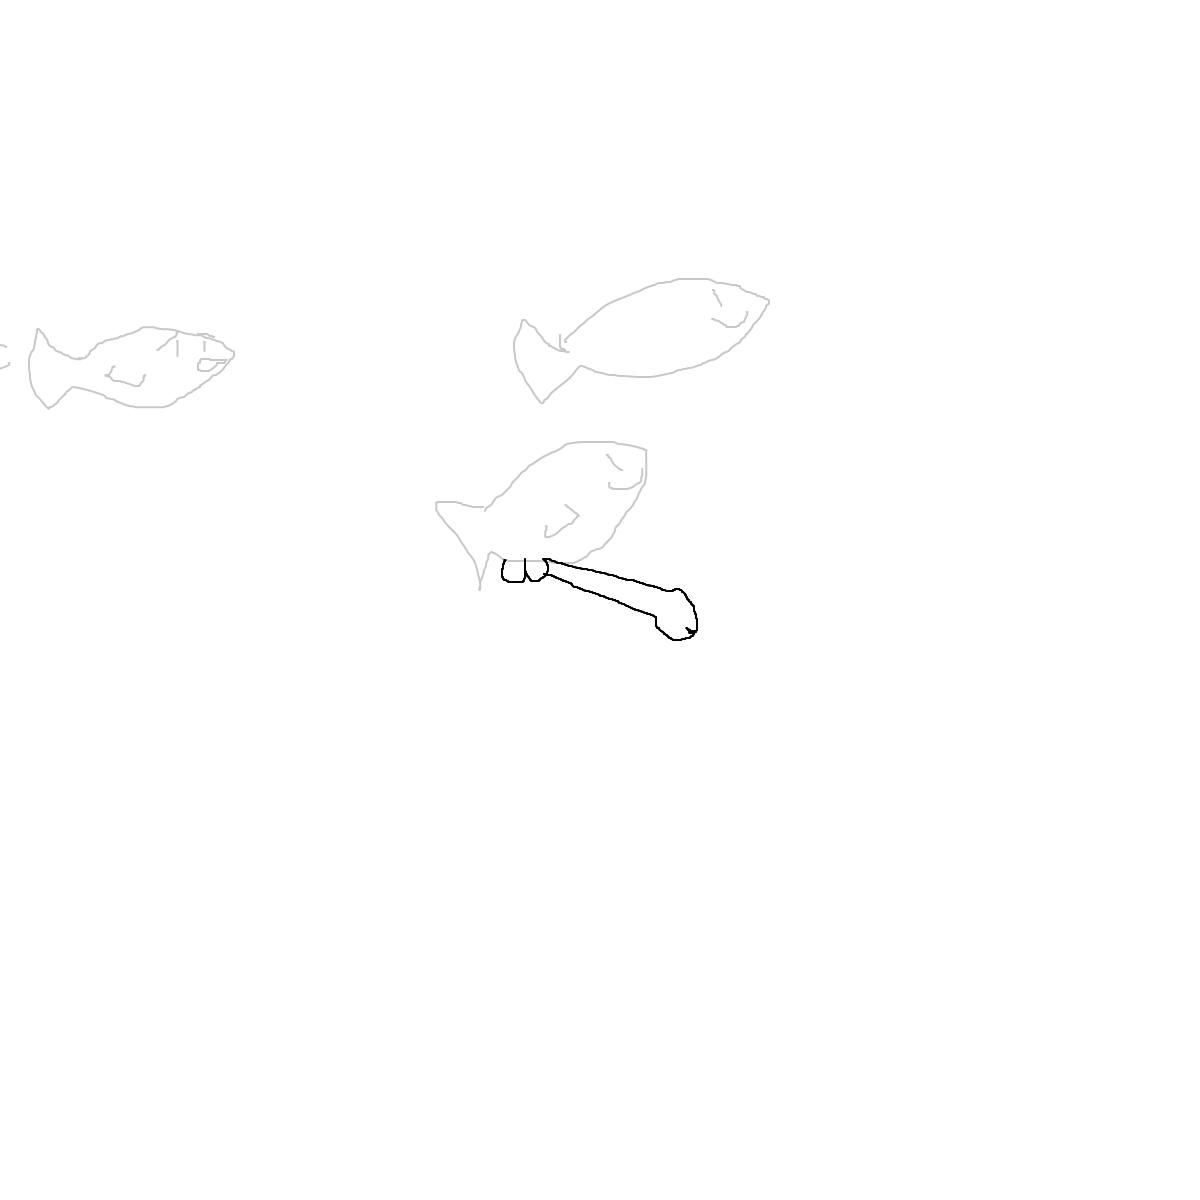 BAAAM drawing#13636 lat:43.5831222534179700lng: -79.3968124389648400